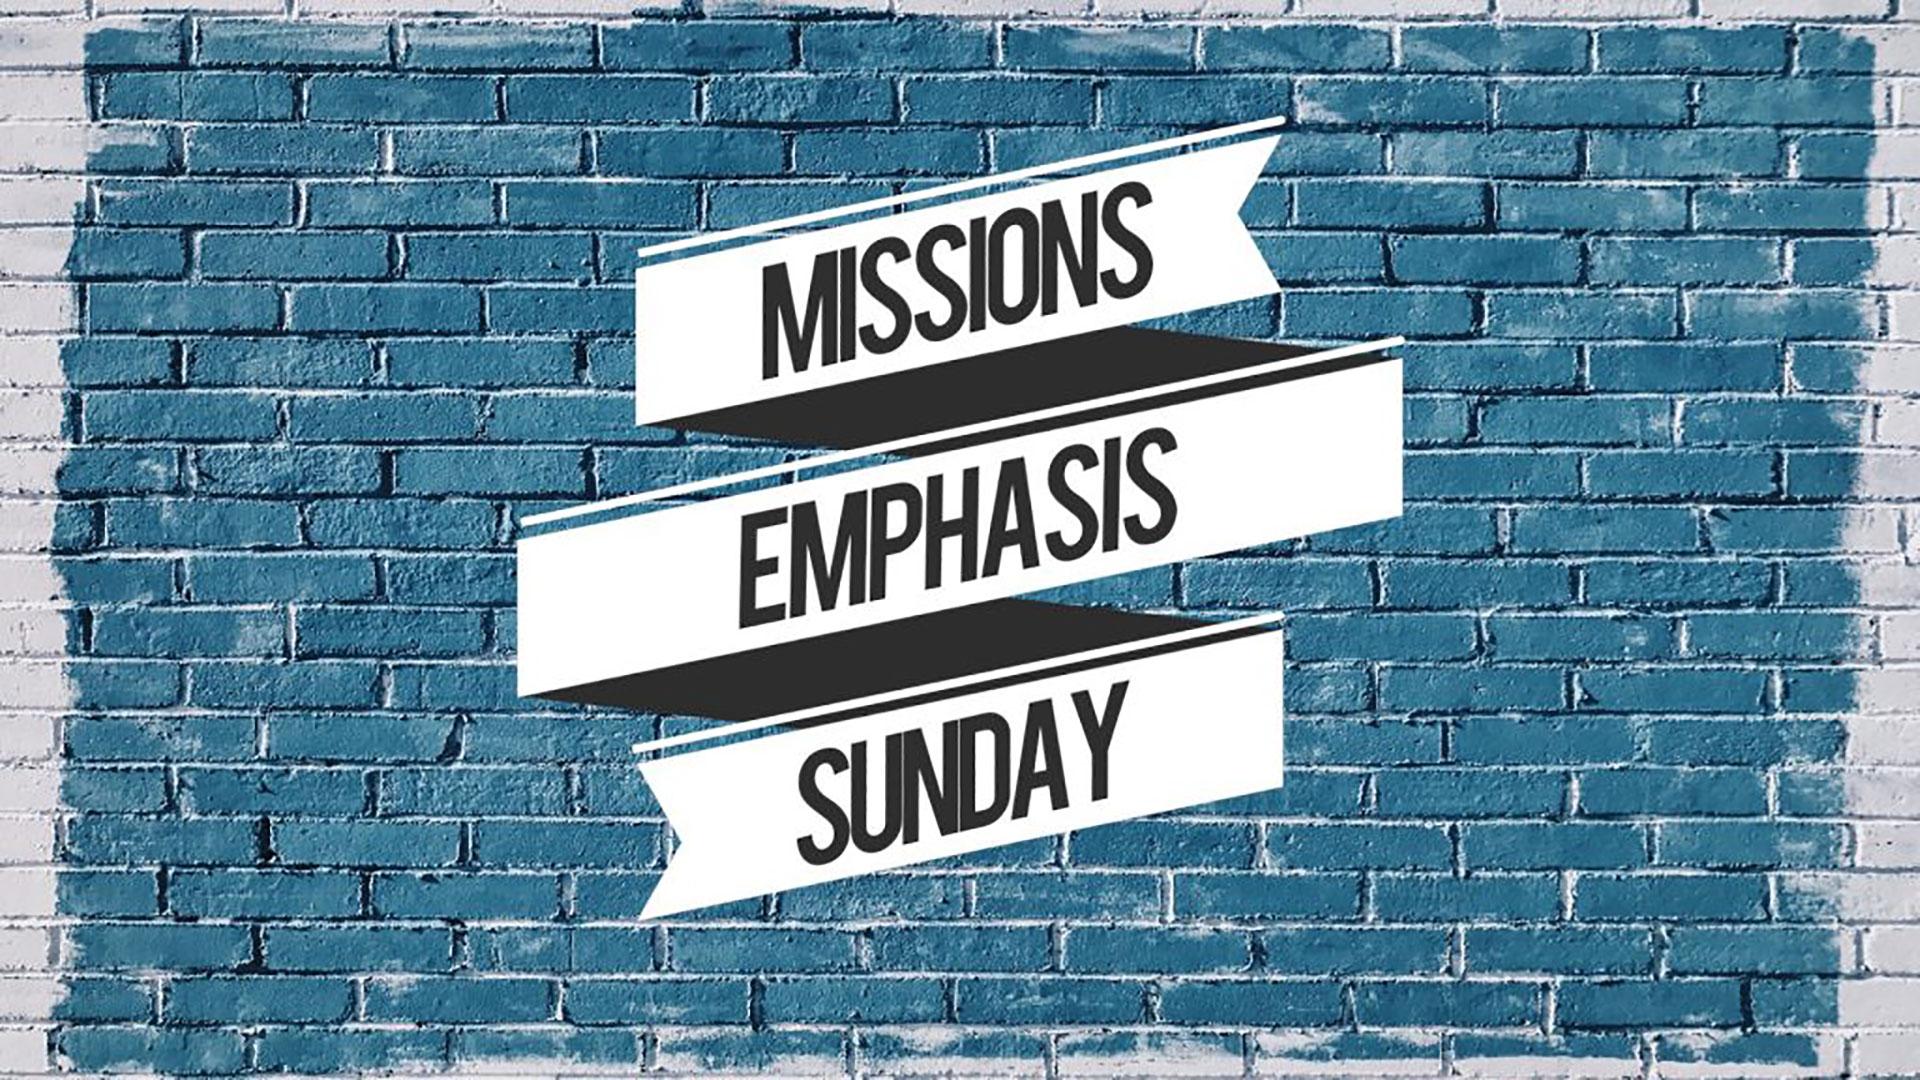 Series: Mission Sunday